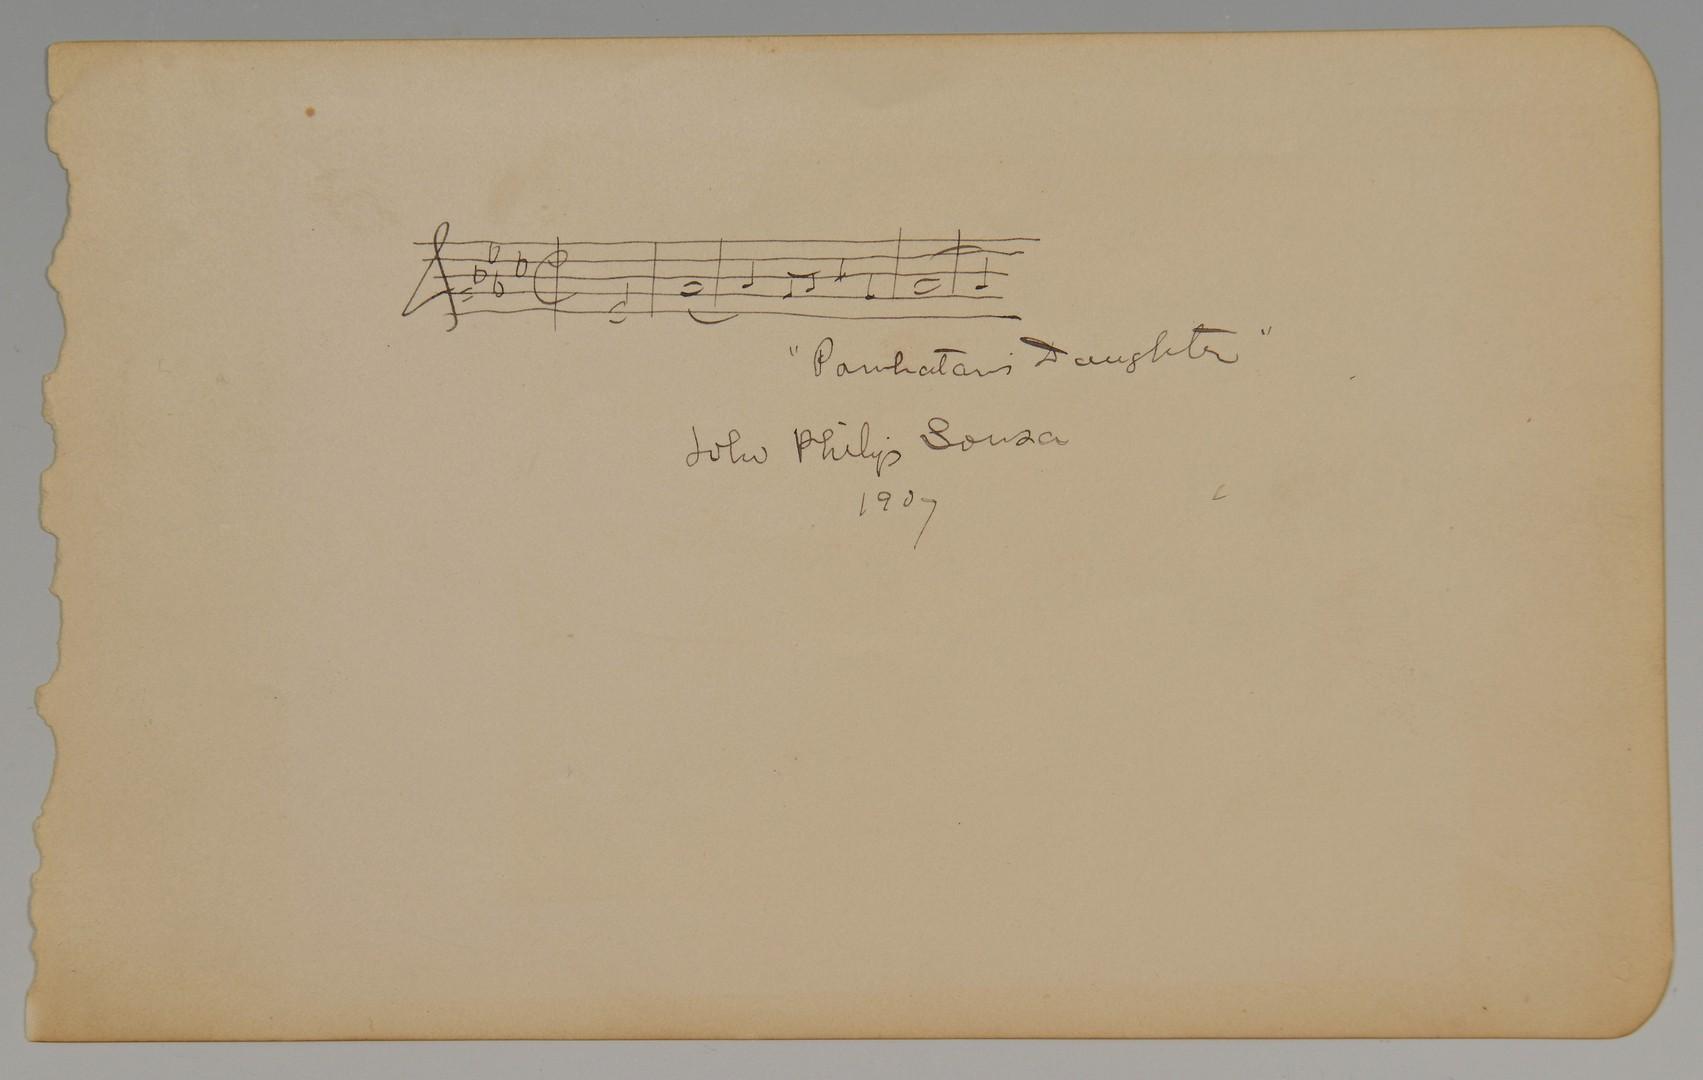 Lot 593: John Philip Sousa Autograph